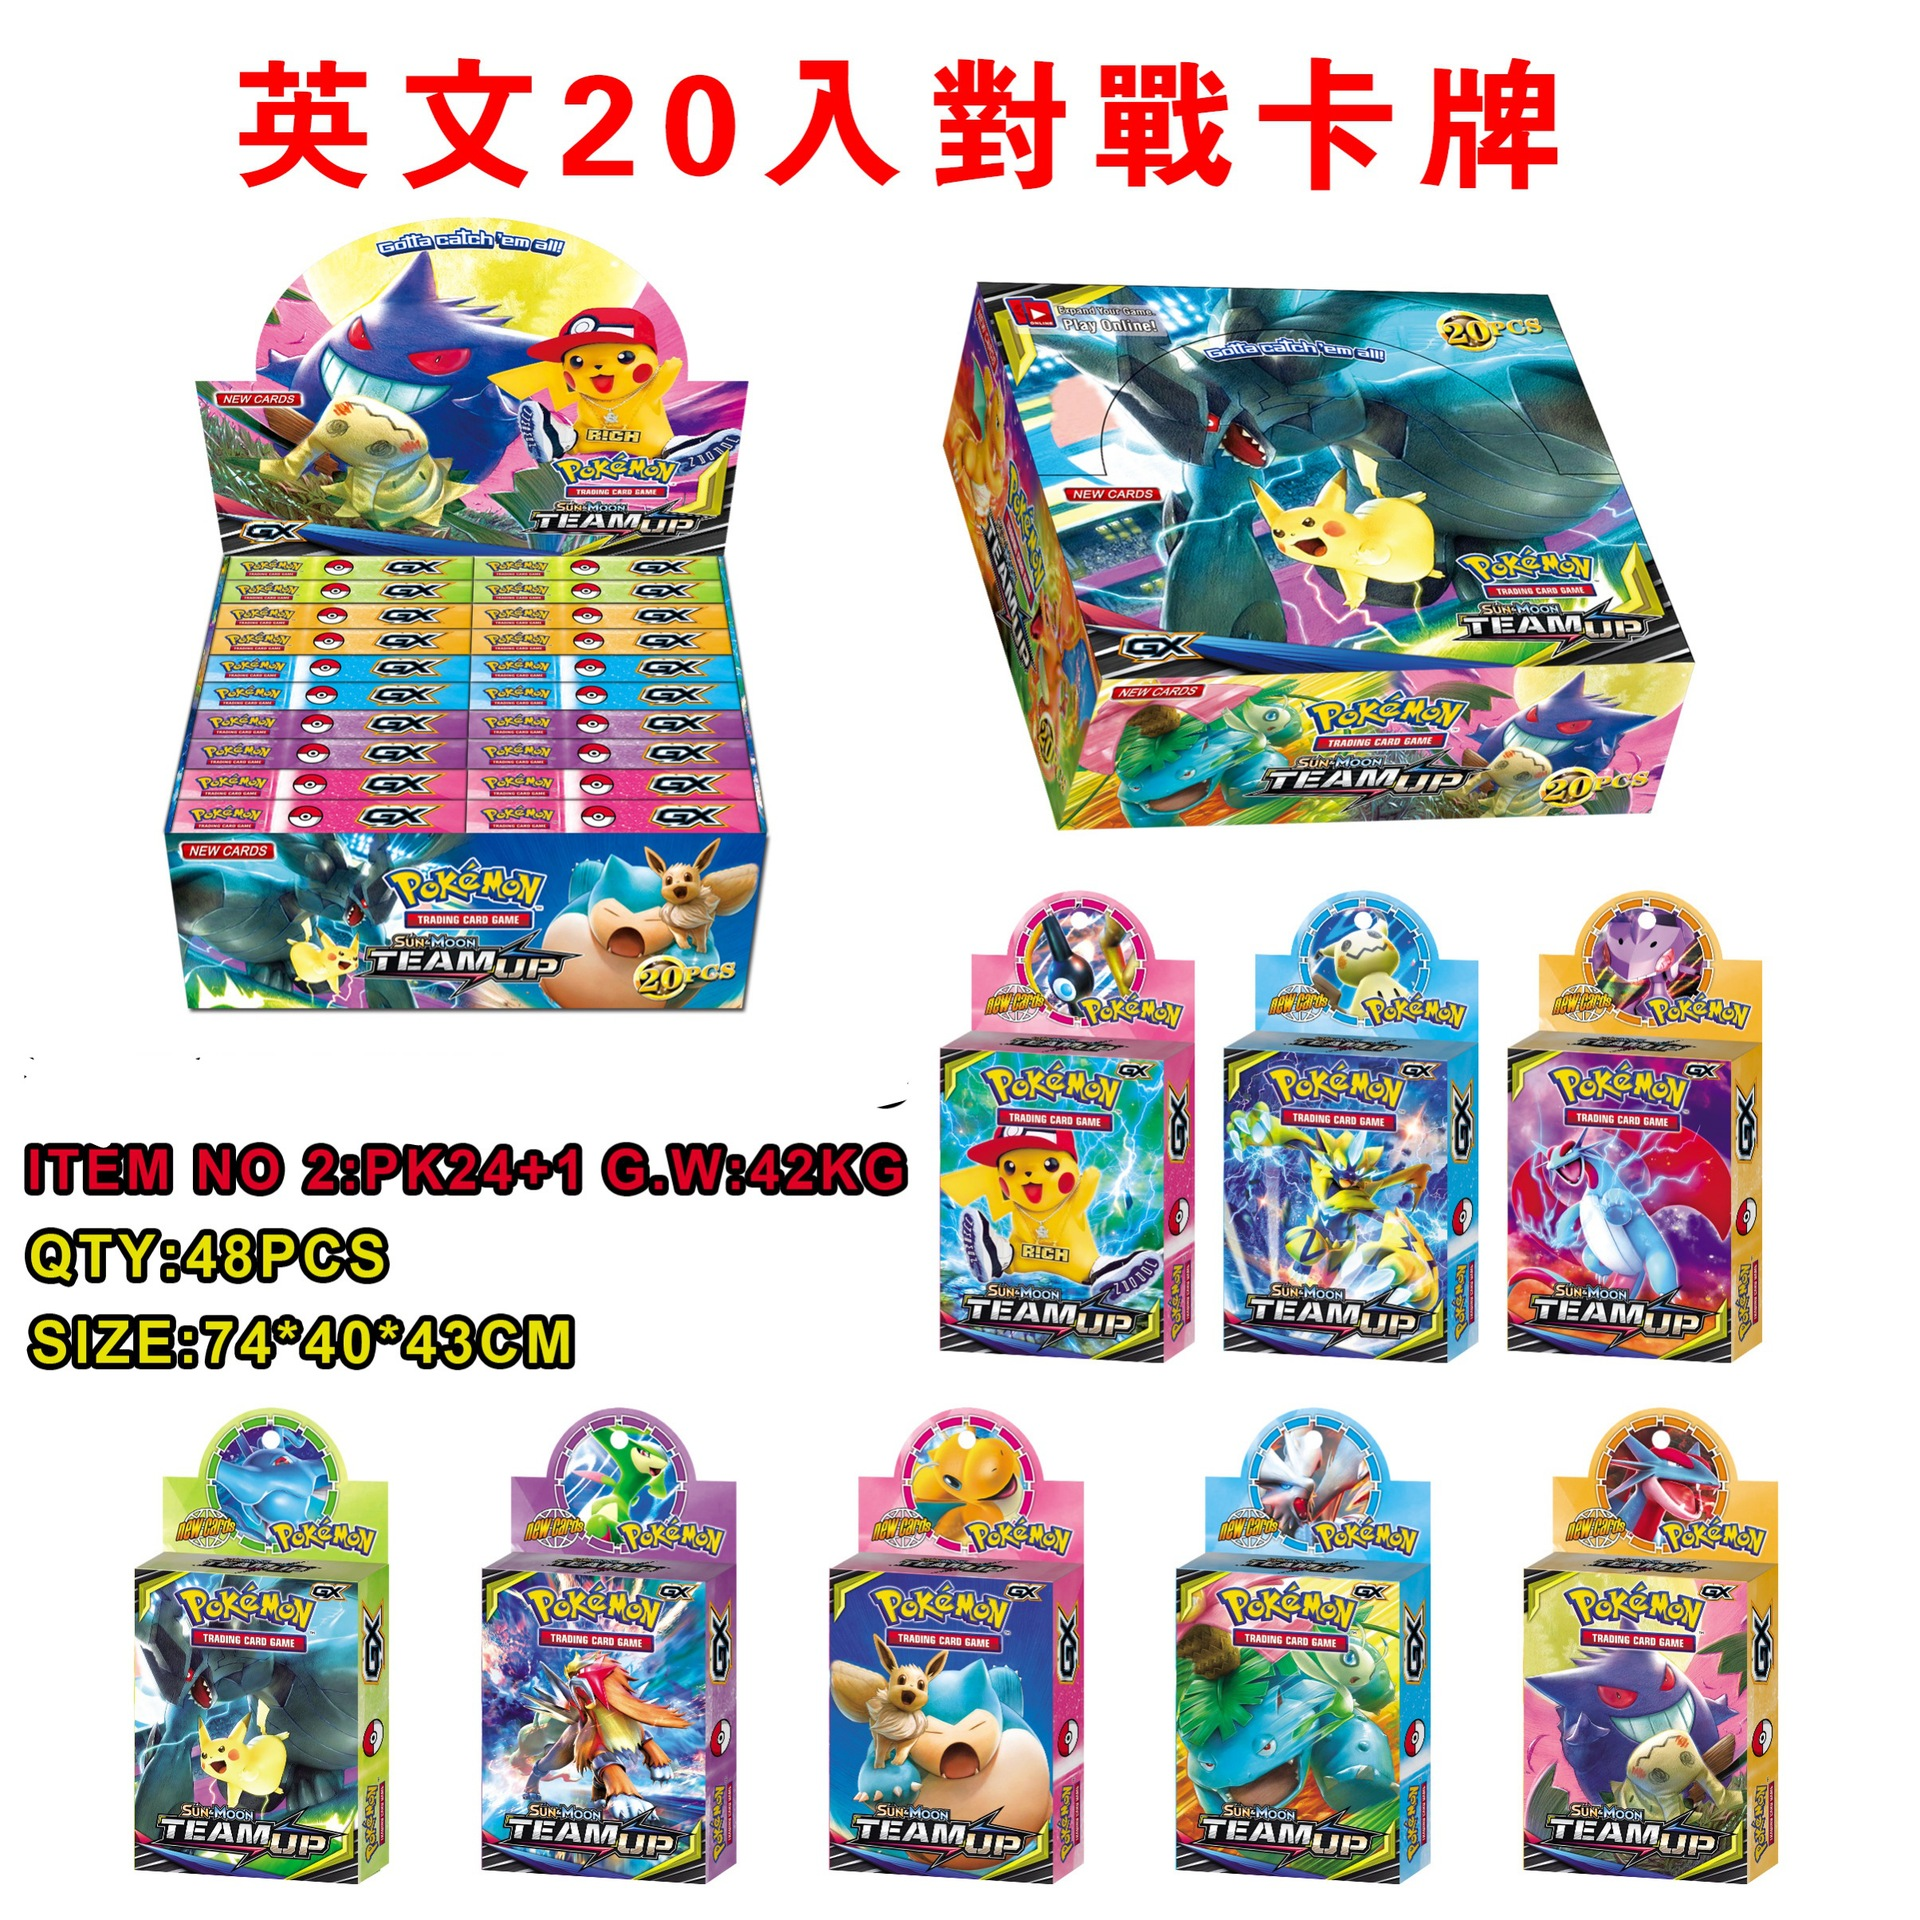 500pcs Newest TAKARA TOMY Pet Pokemon Cards Contain Flash Card Pokemon TEAM UP Cards Kids Toys Pokemon Gx Cards